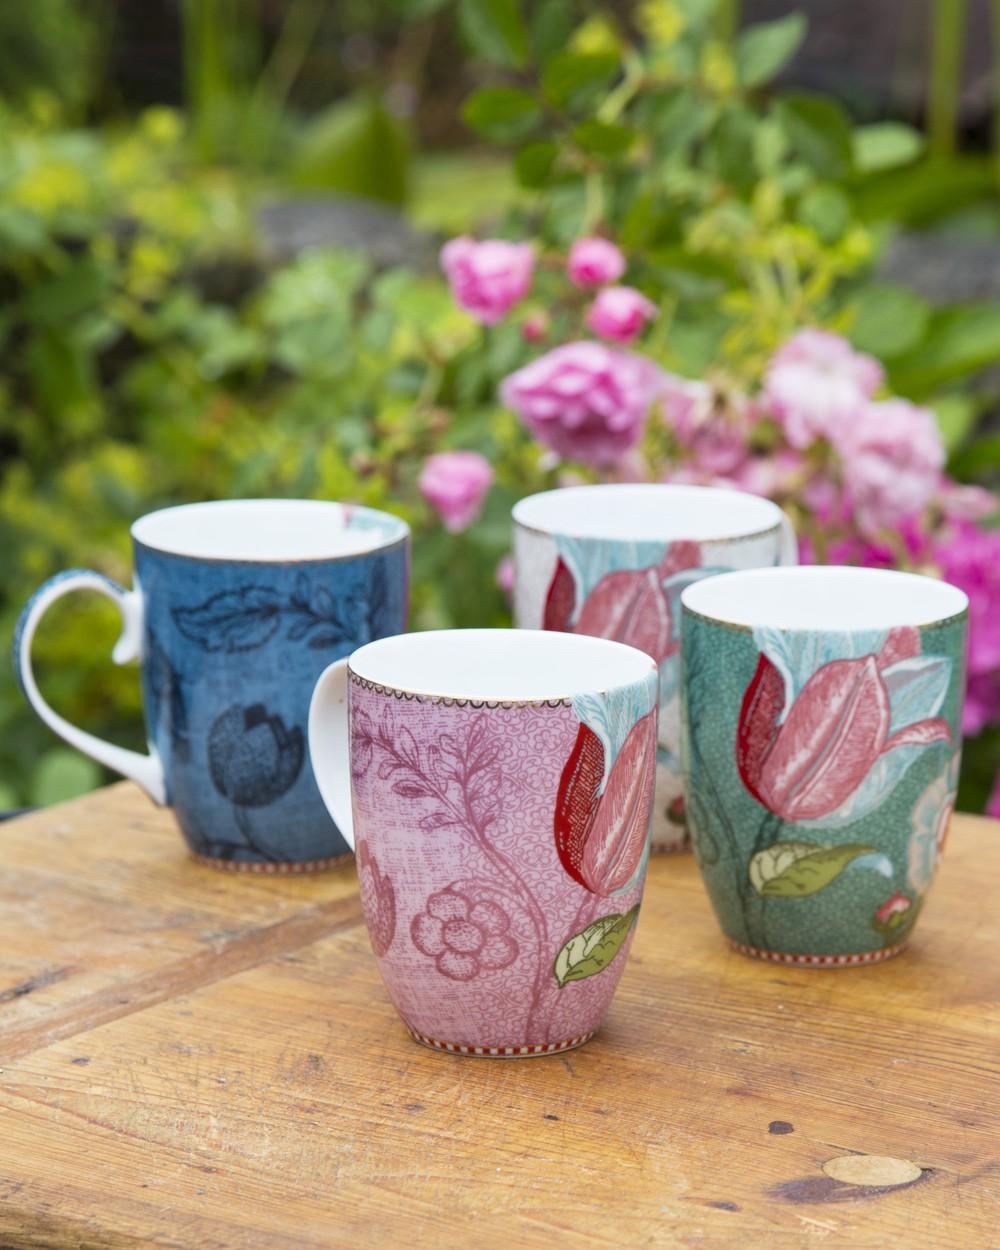 Pip Spring to Life Mug & Pip Spring To Life Mug - Home u0026 Food   Avoca ®